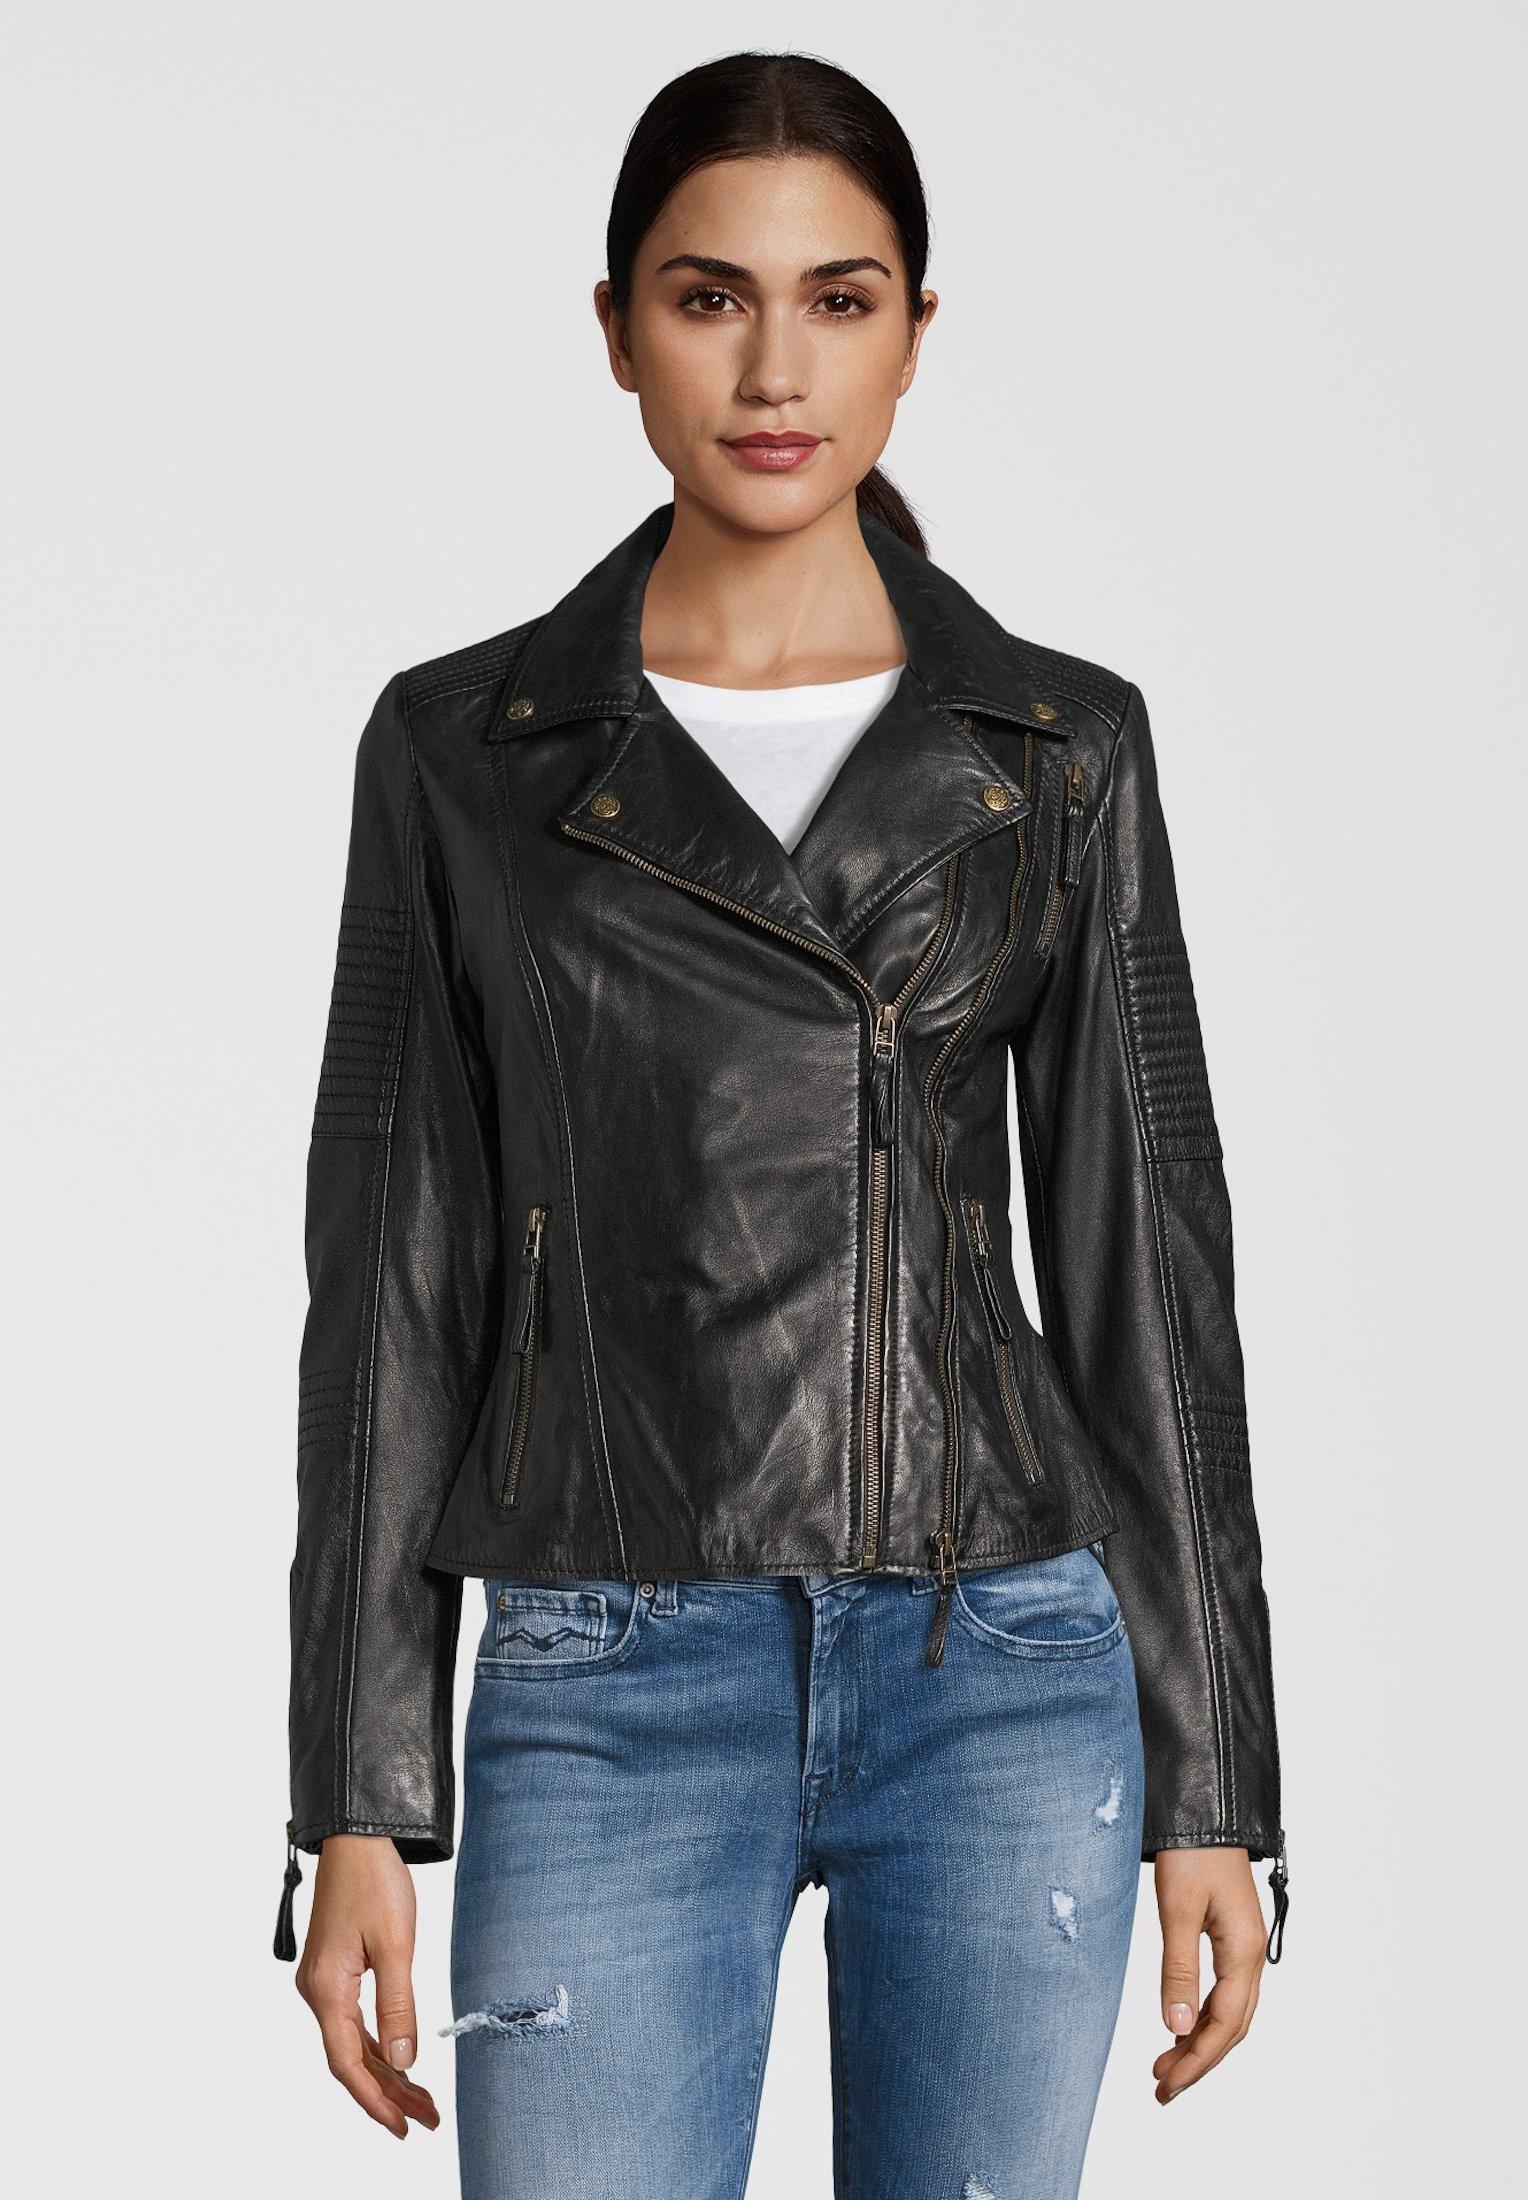 Femme LEDERJACKE MUFFIN - Veste en cuir